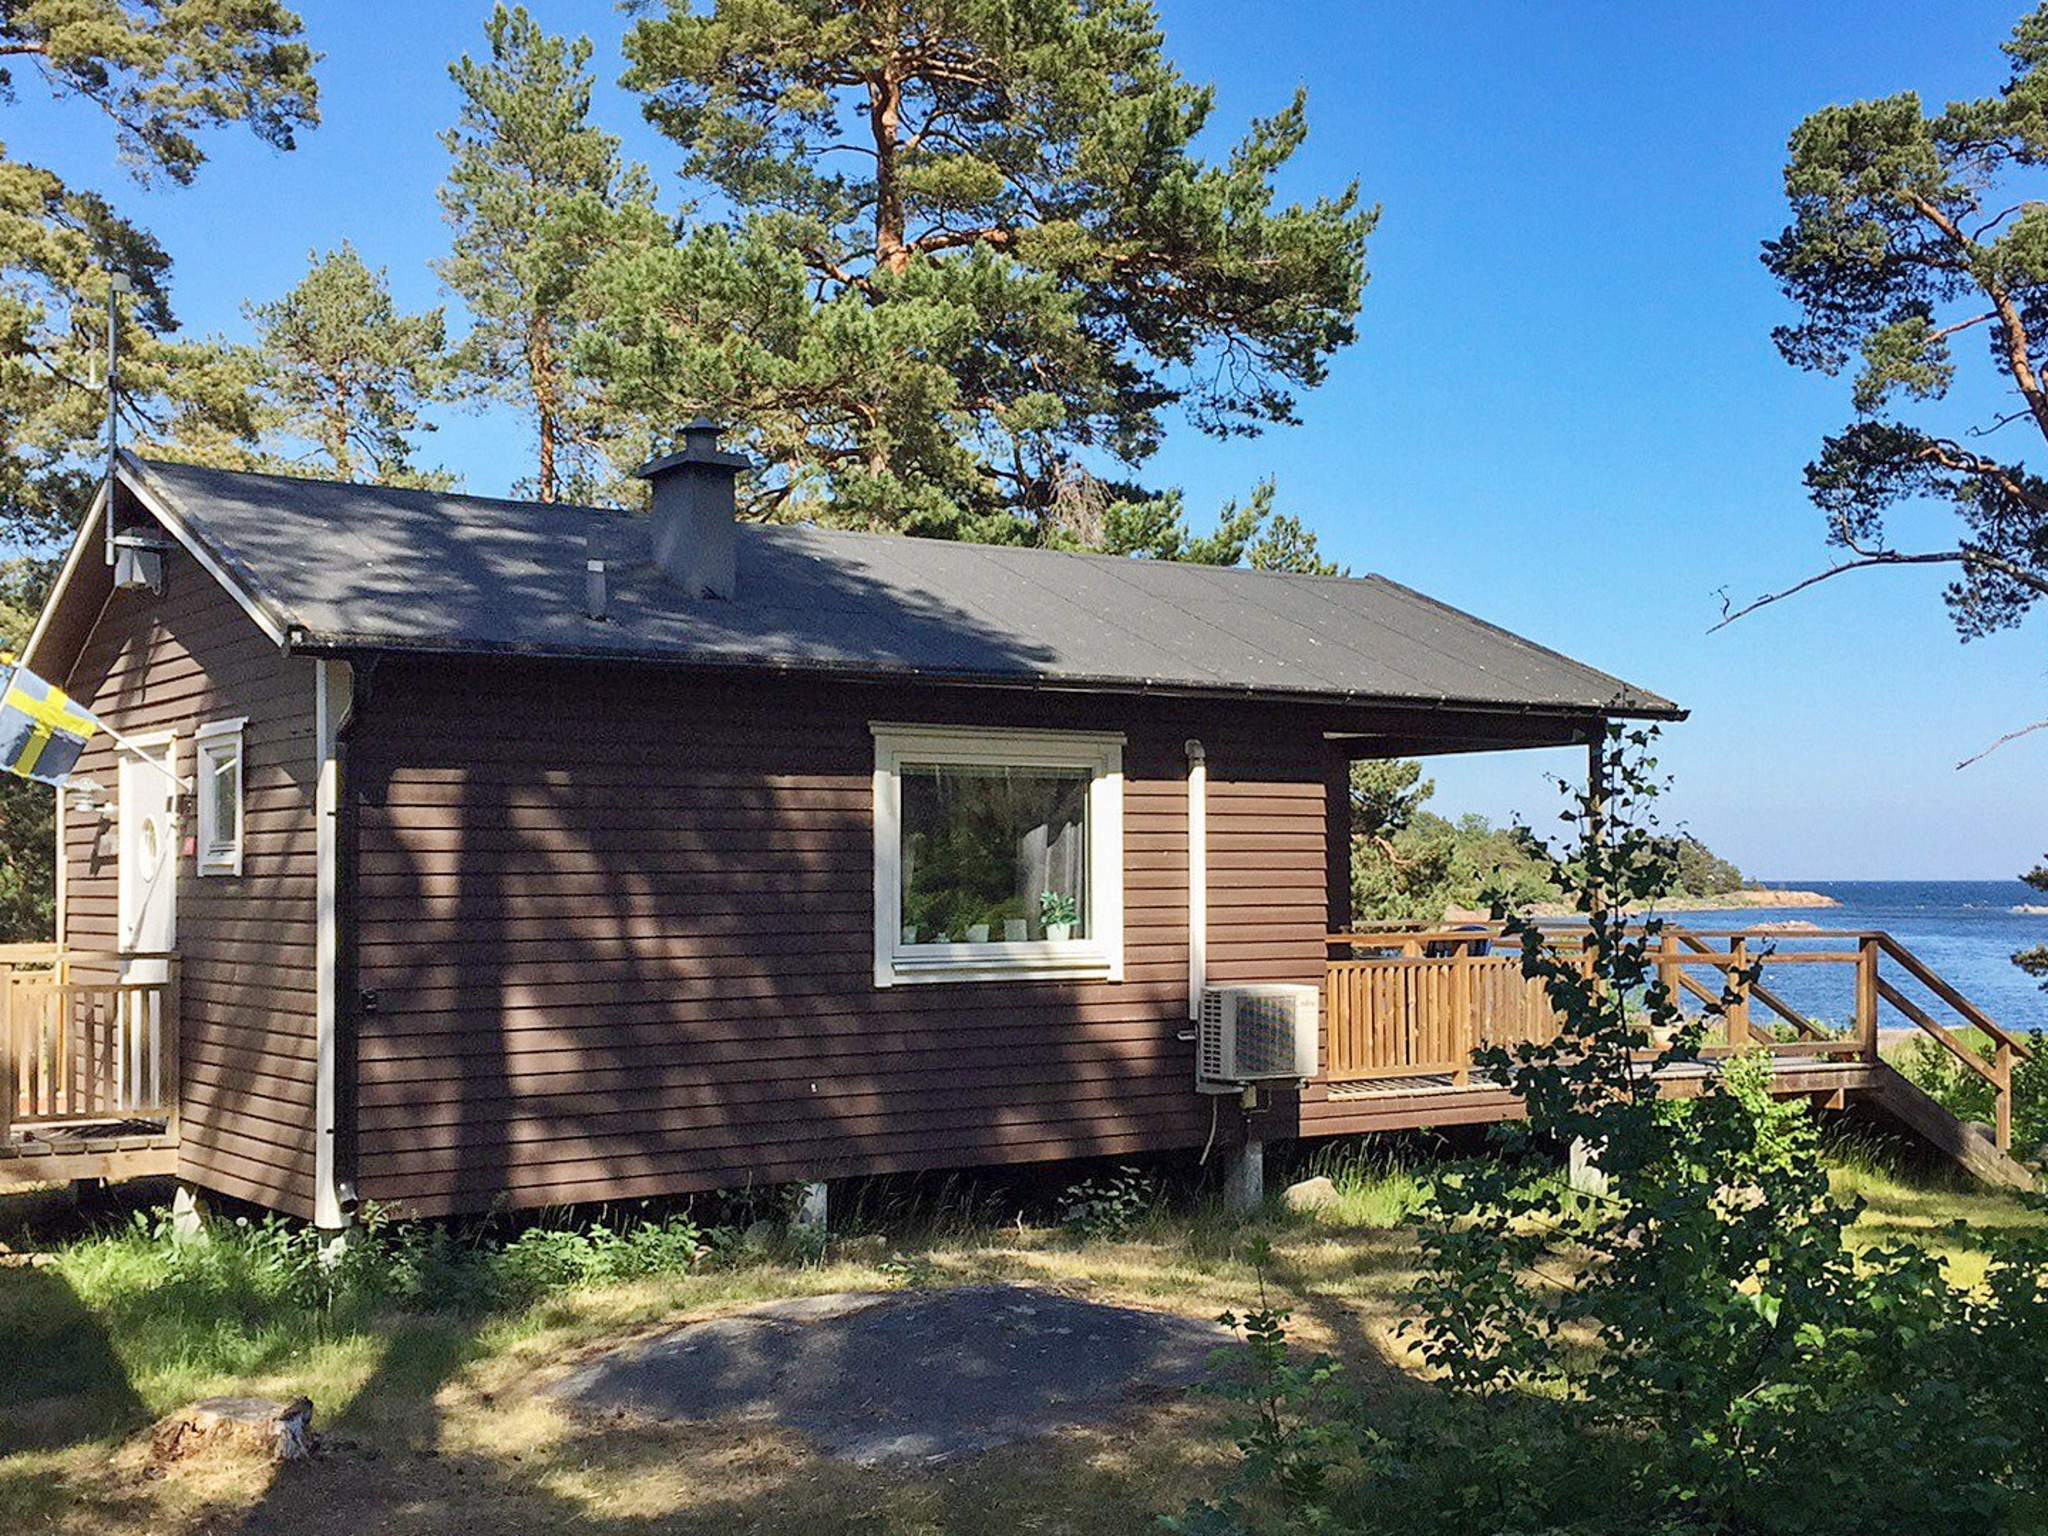 Ferienhaus Oskarshamn (2358219), Oskarshamn, Kalmar län, Südschweden, Schweden, Bild 13